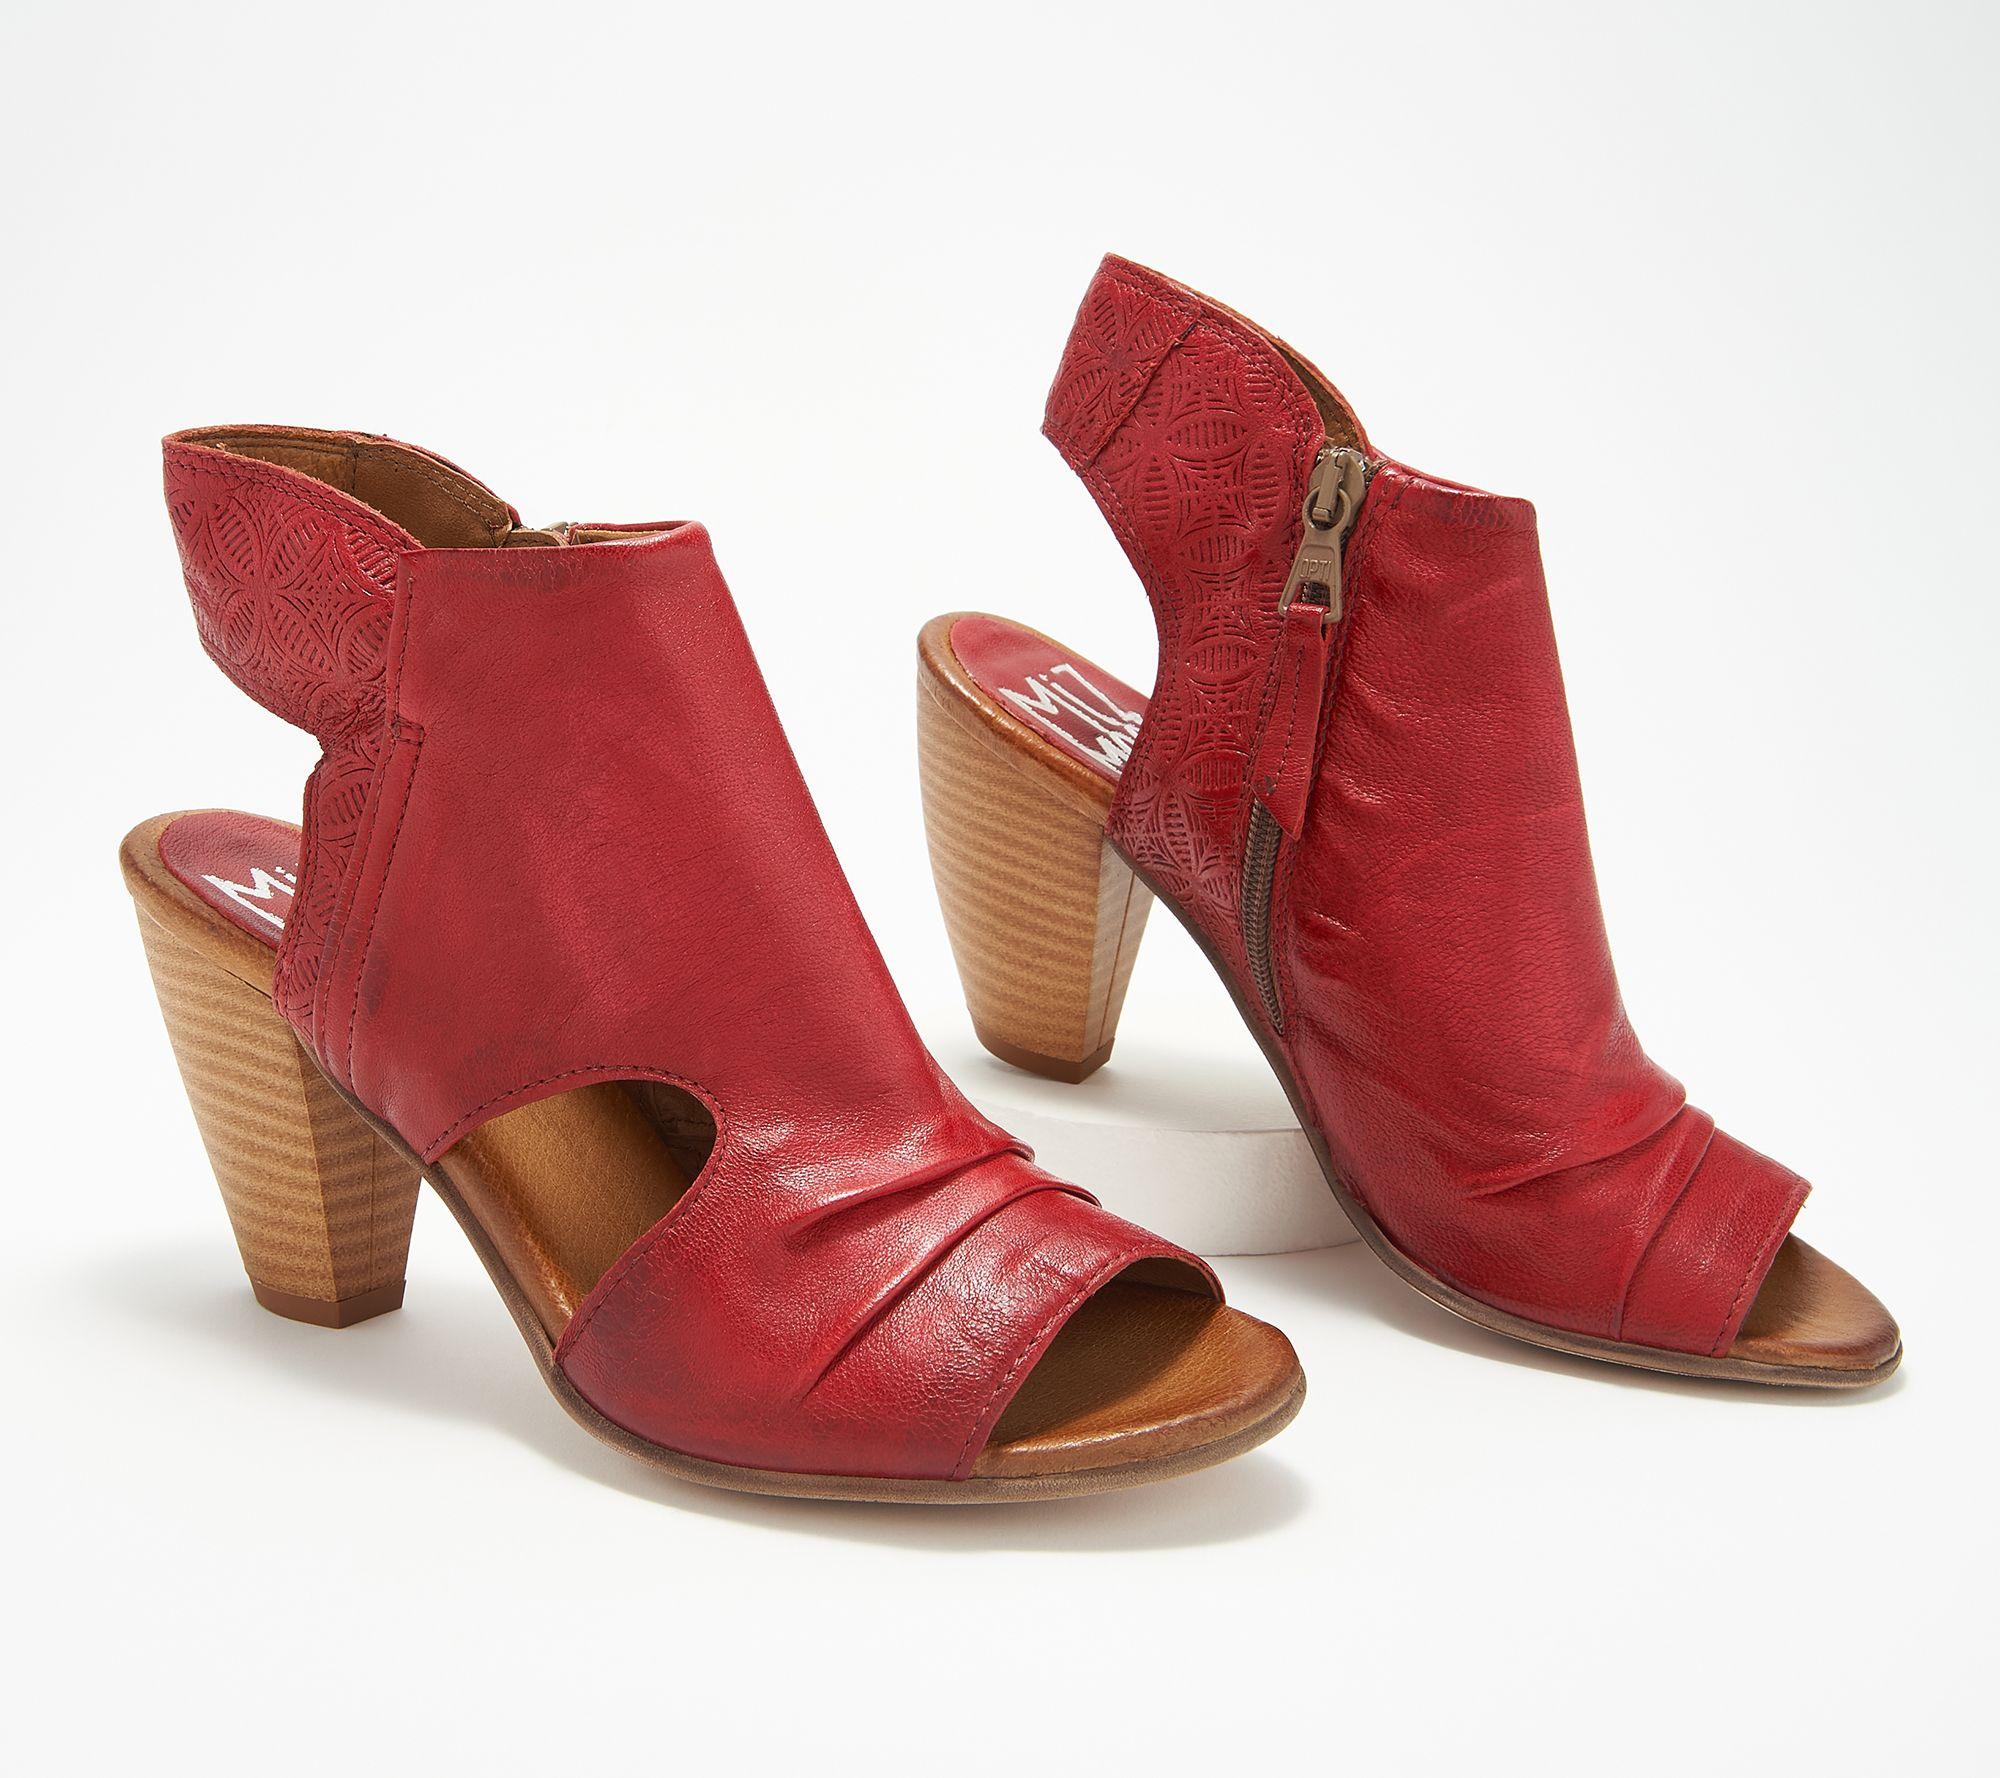 5e39b3f5b47a Miz Mooz Leather Peep-Toe Heeled Sandals - Mindy - Page 1 — QVC.com